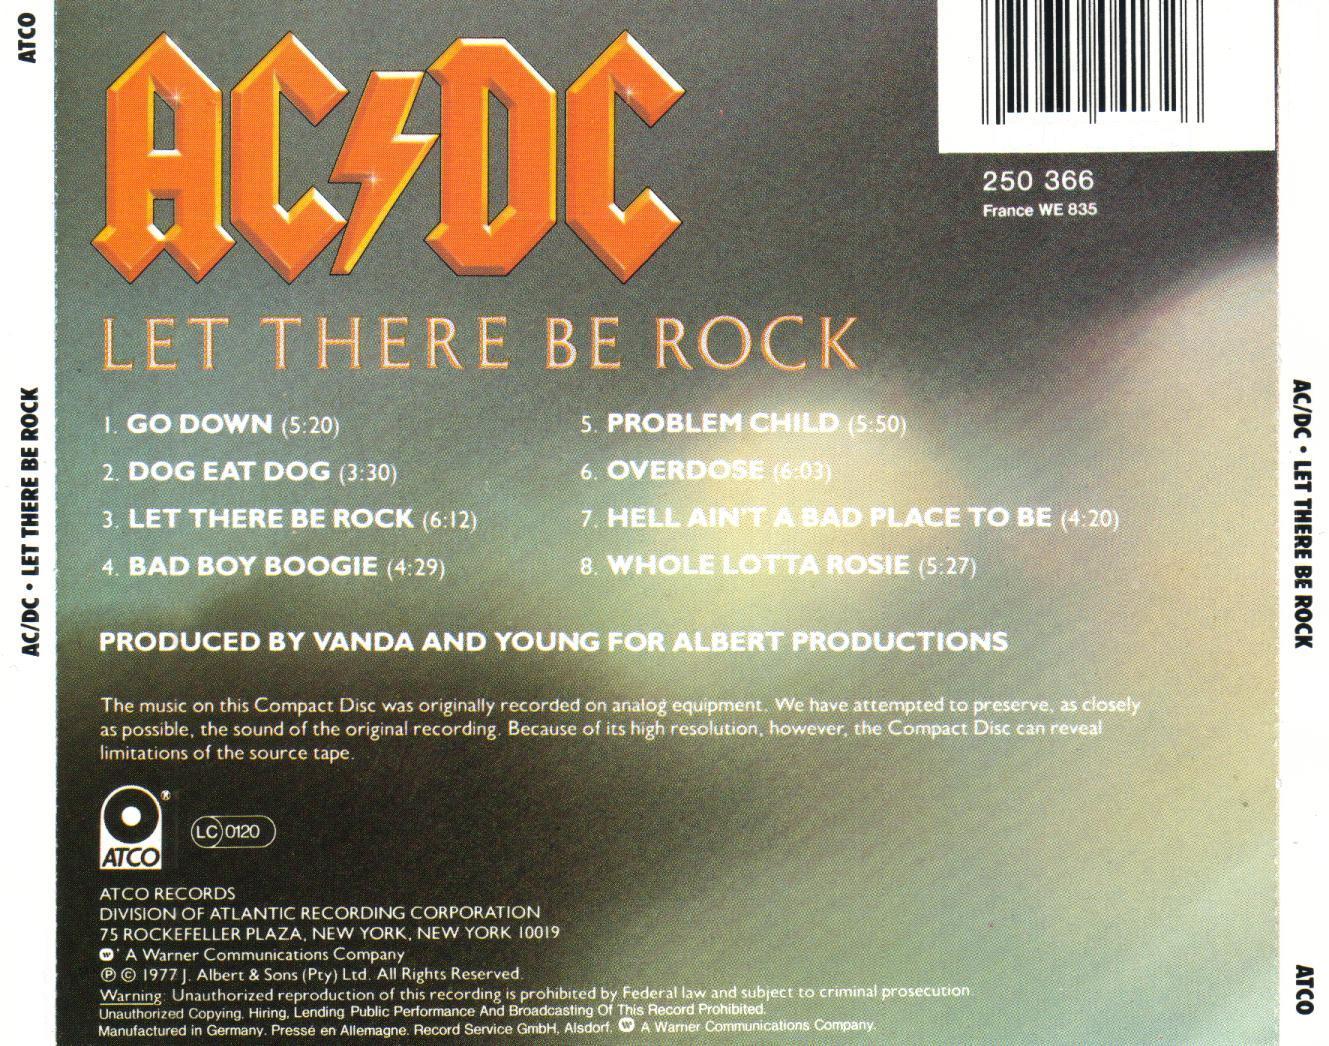 [Megapost][Imagenes] AC/DC Albumes, Singles & DVDs